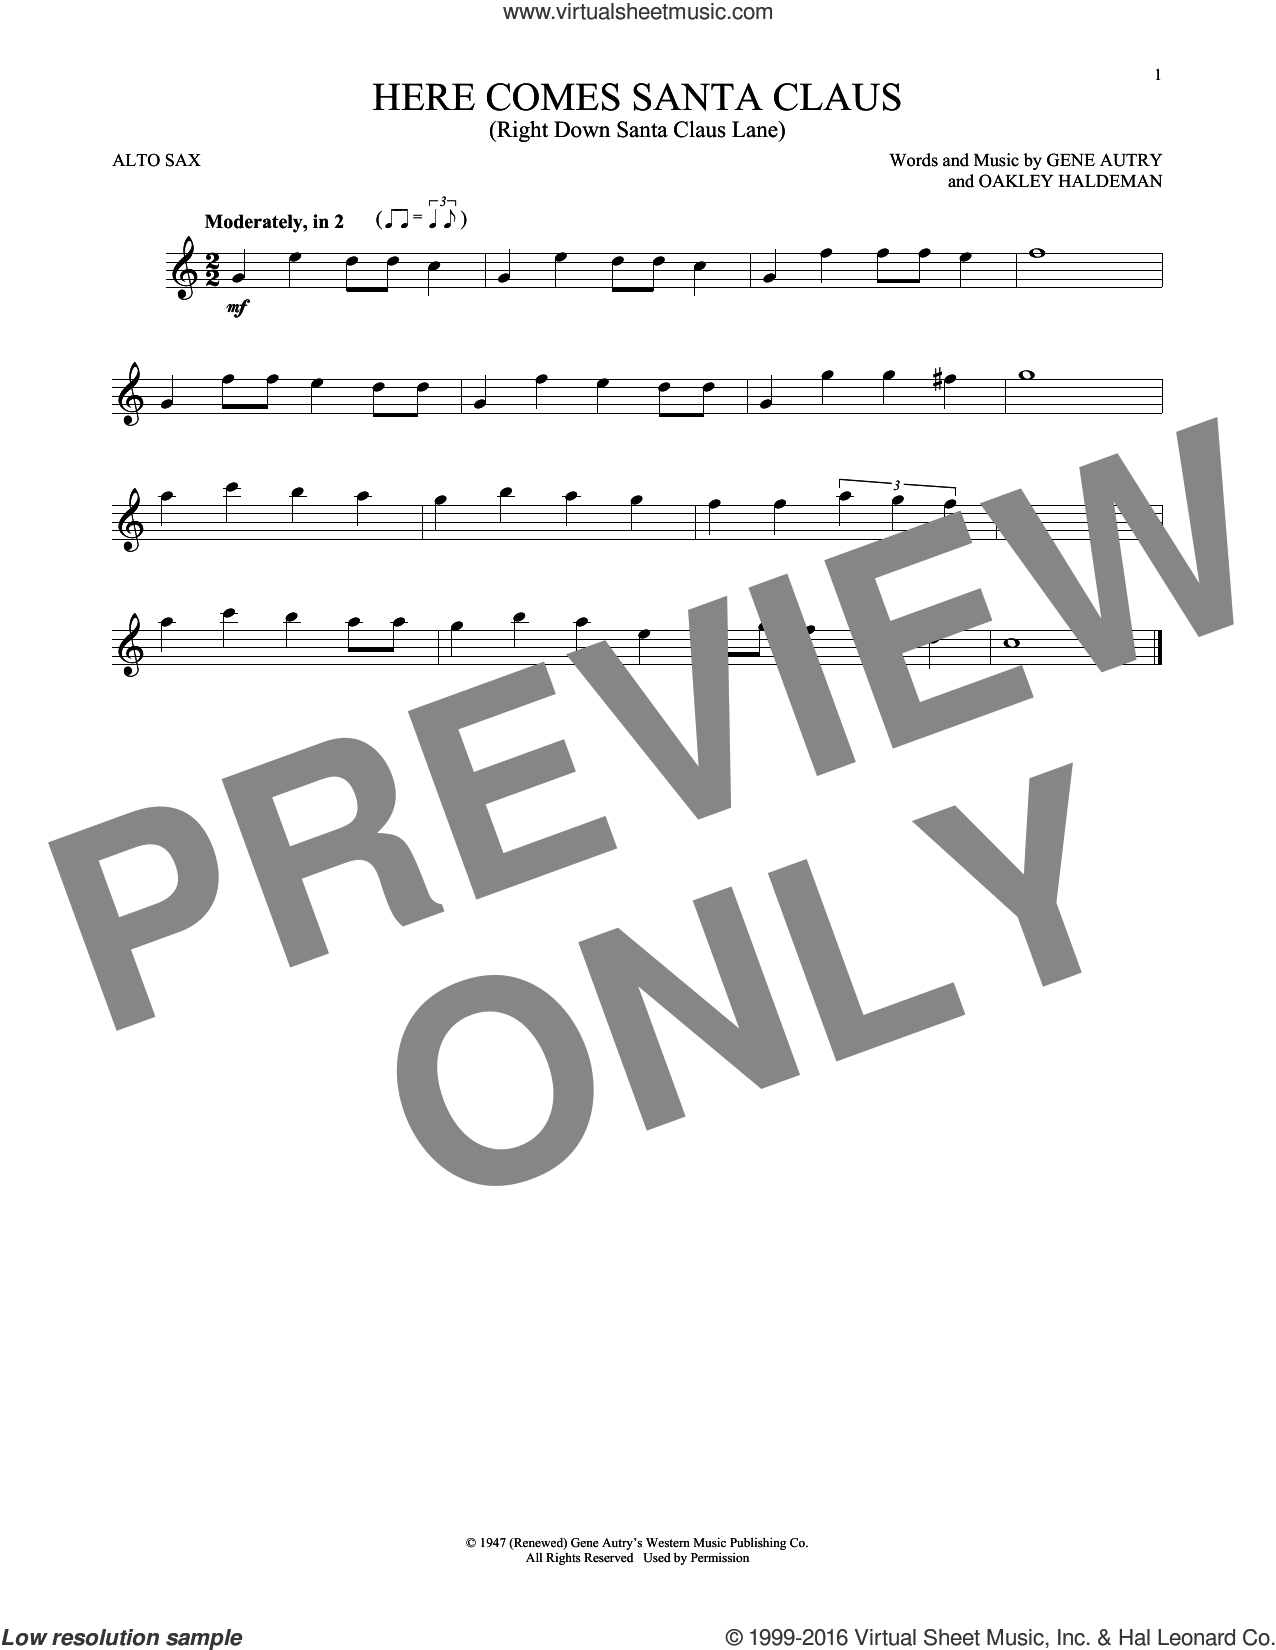 Here Comes Santa Claus (Right Down Santa Claus Lane) sheet music for alto saxophone solo by Gene Autry, Carpenters and Oakley Haldeman, intermediate skill level